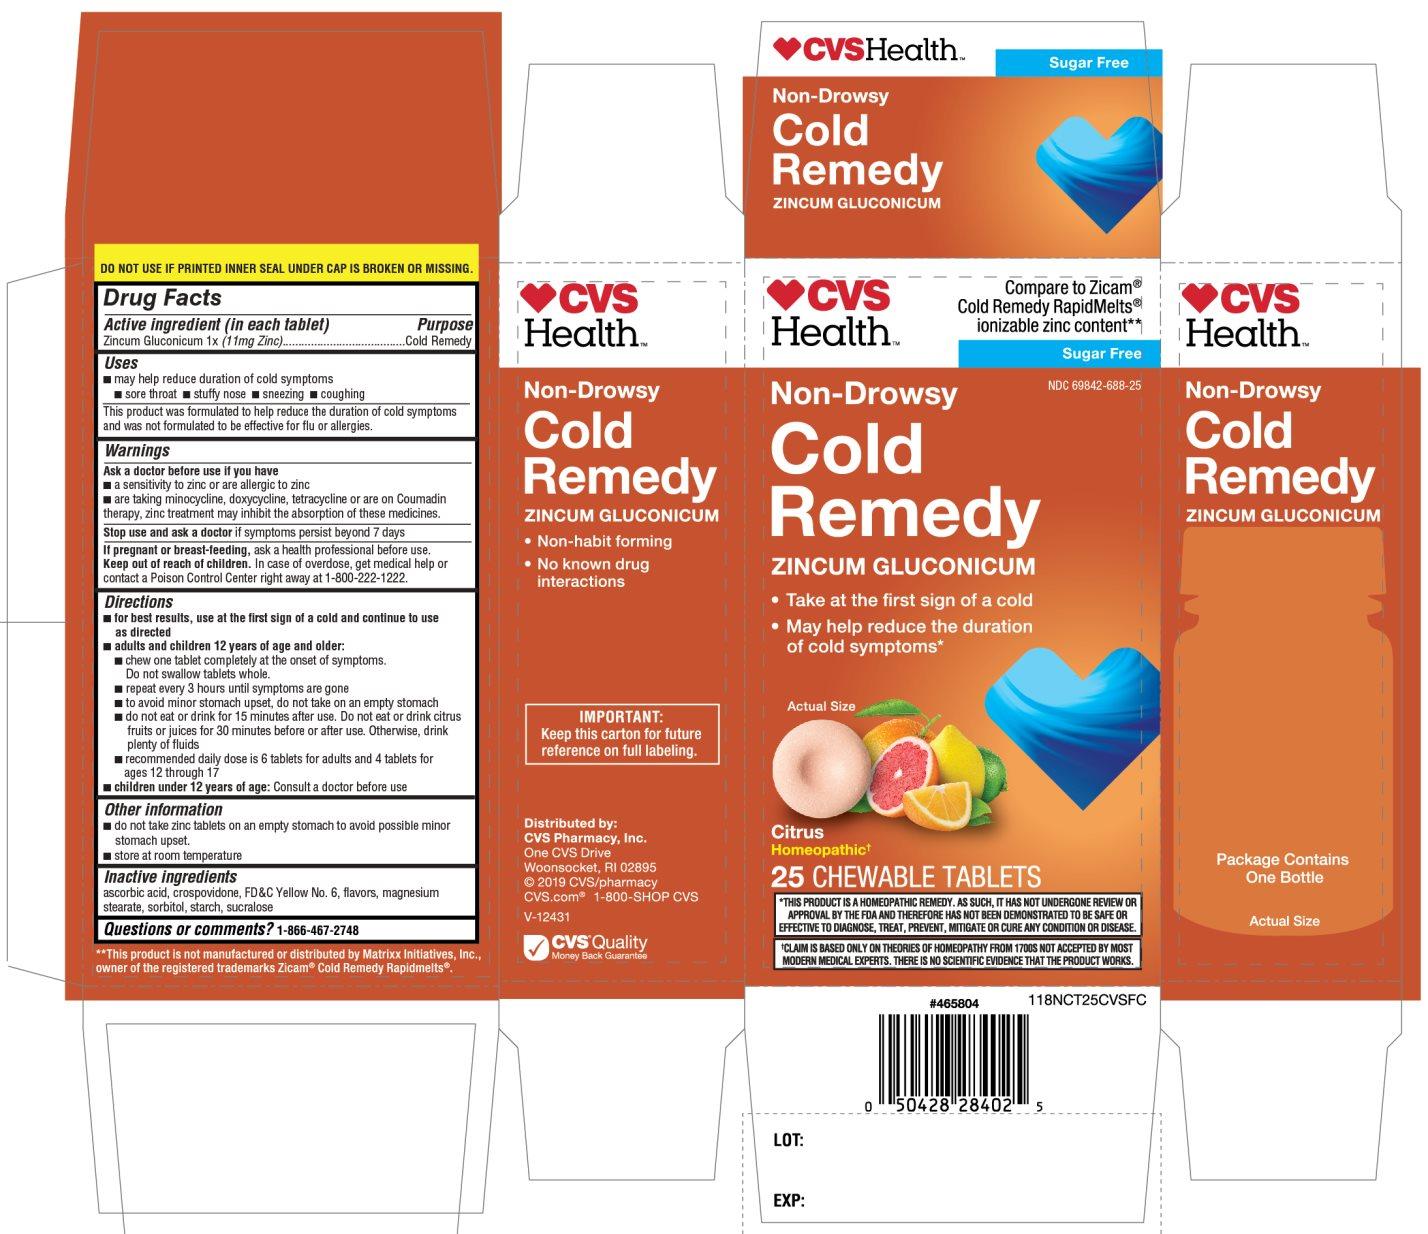 CVS Health Cold Remedy Zincum Gluconicum Citrus Flavor